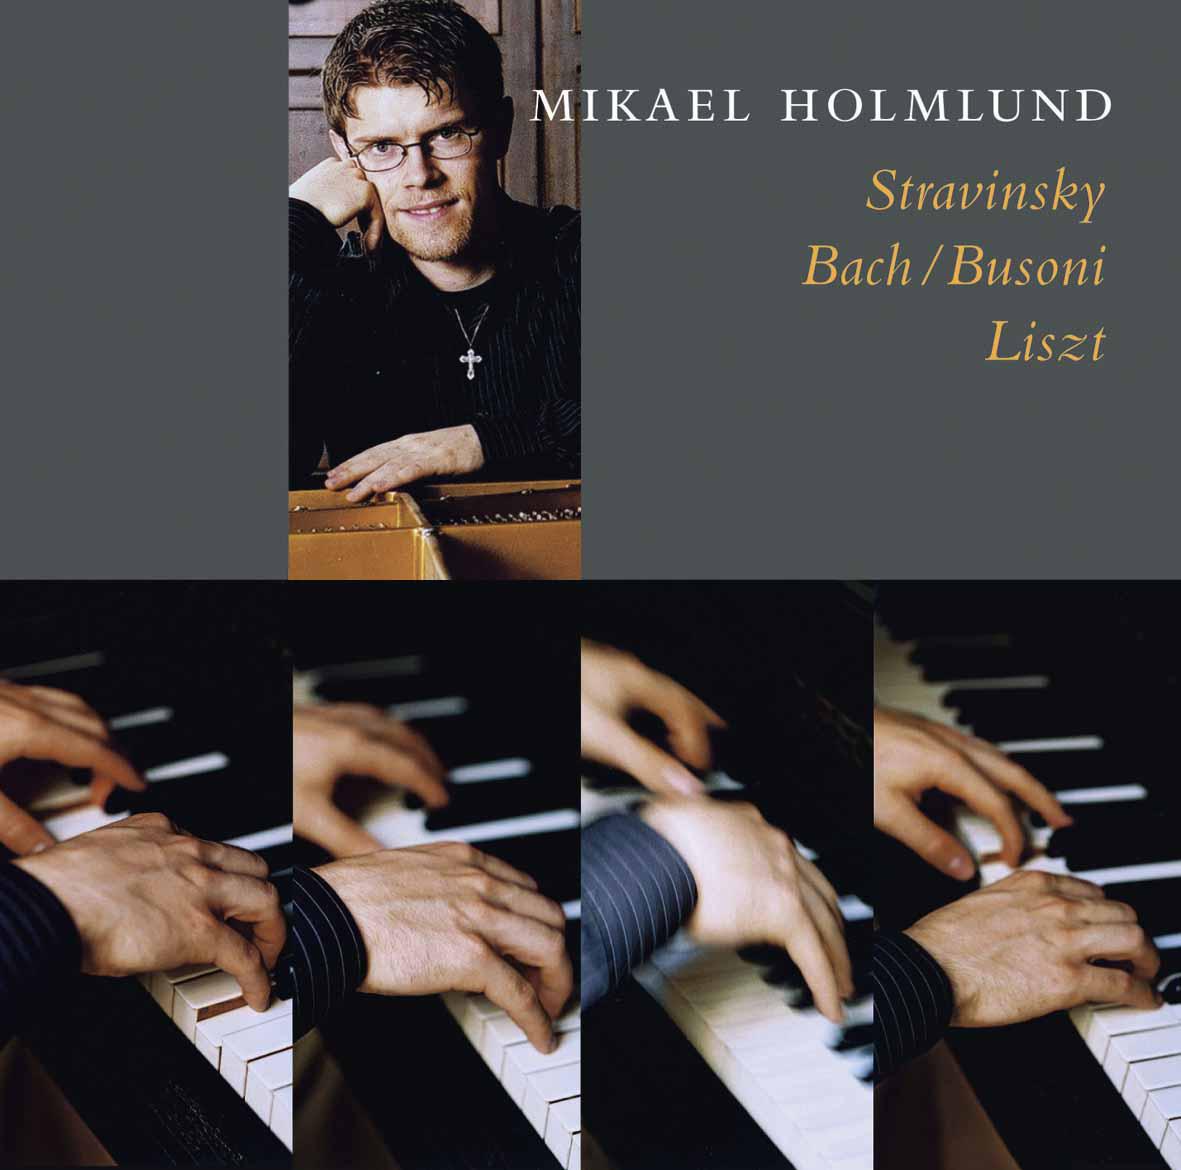 Mikael Holmlund, piano